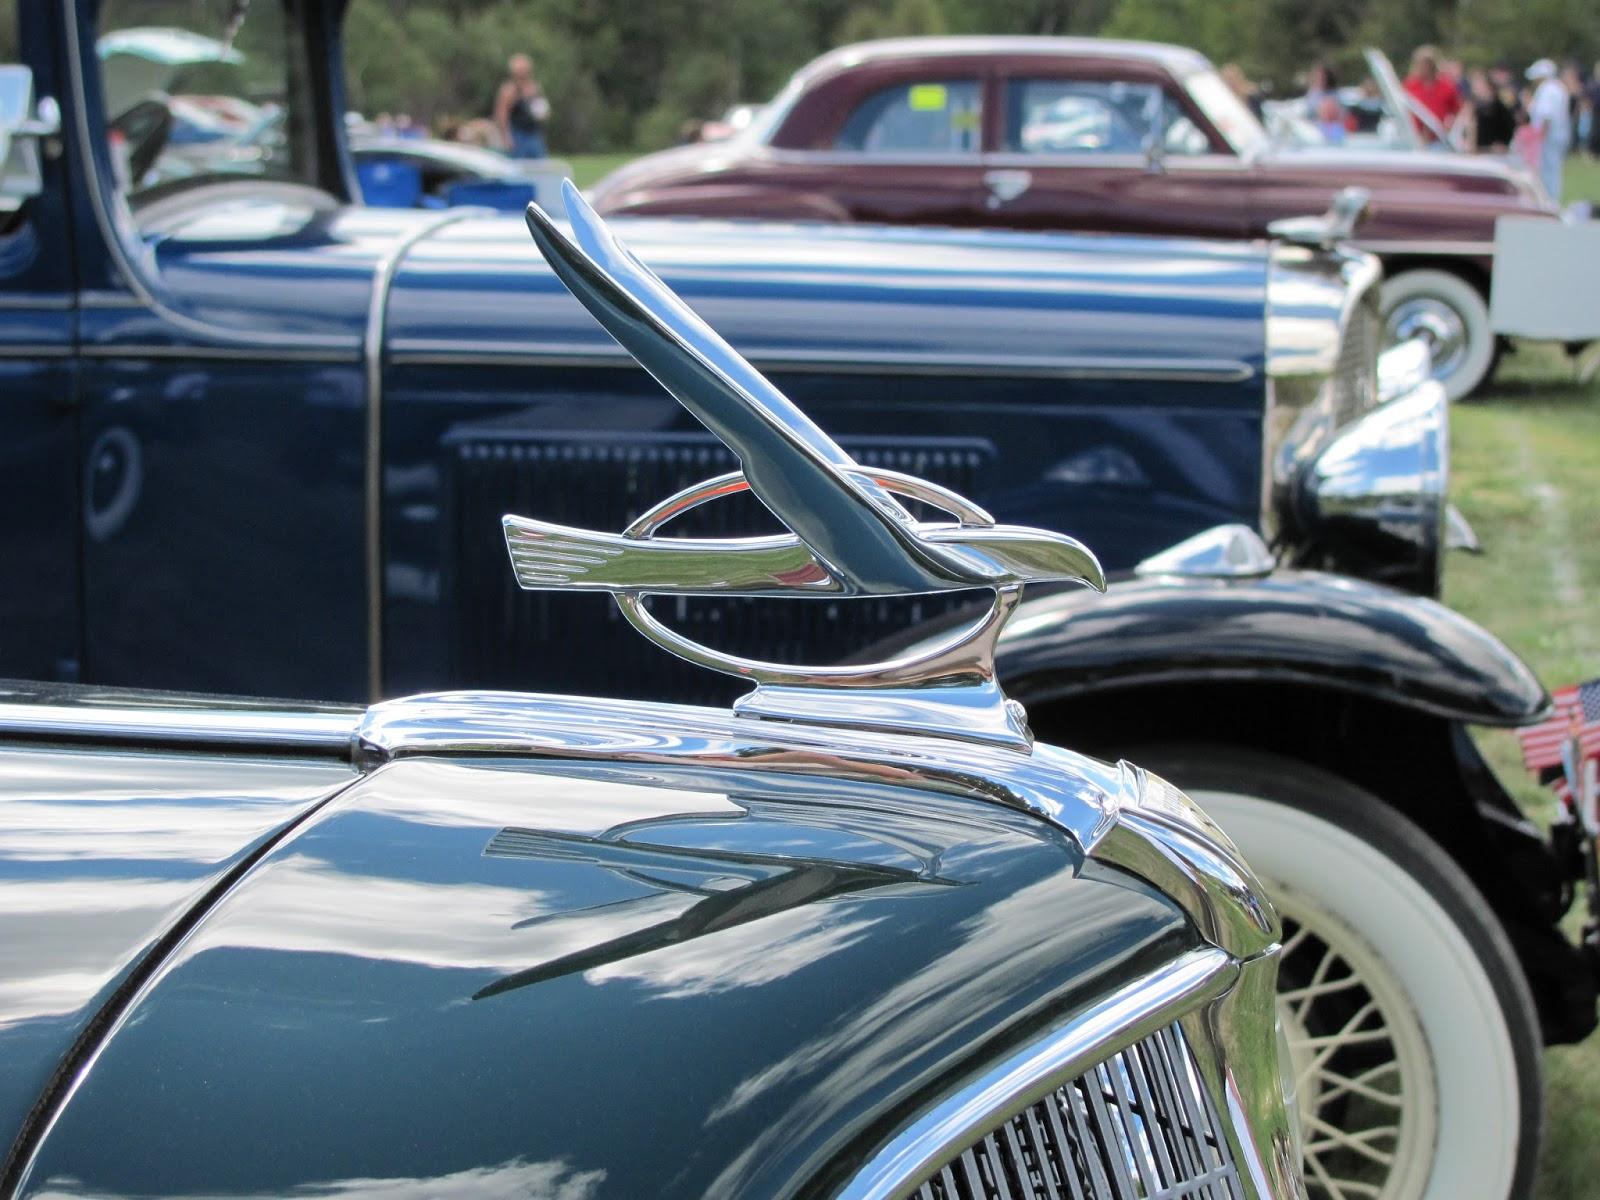 Ashby, Mass.: HCB 7th Annual Car Show for Veterans